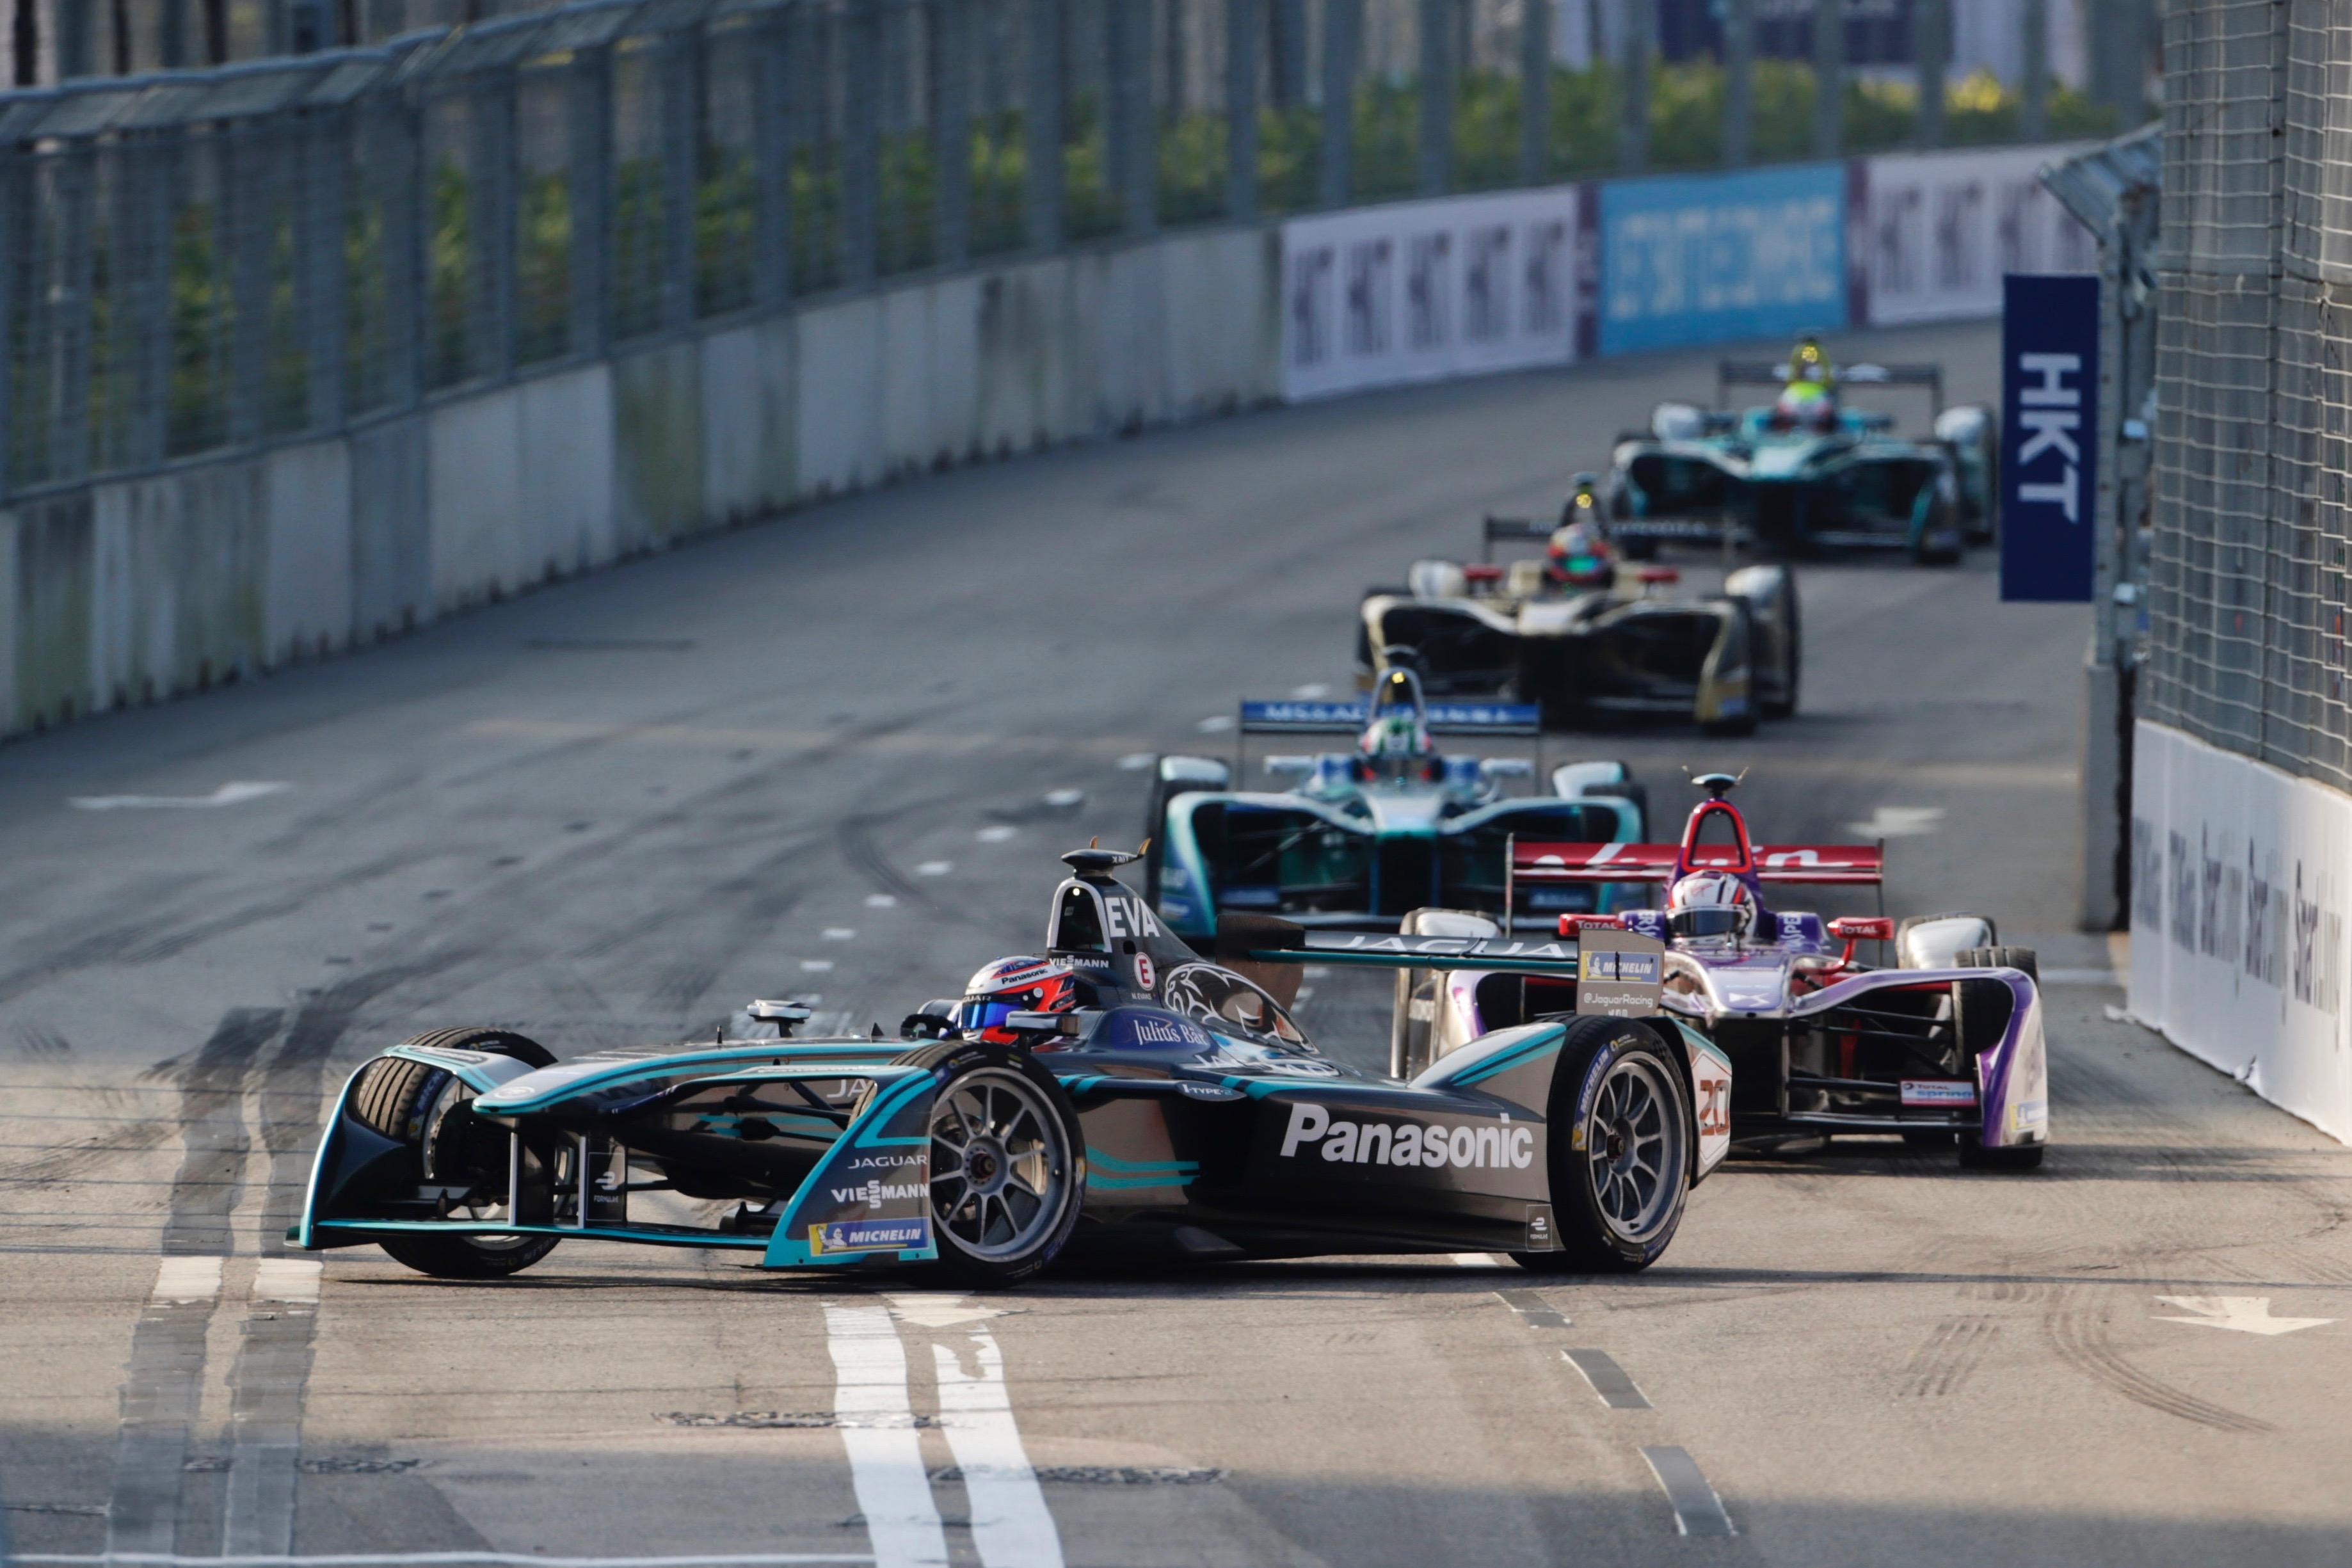 Formula E: The All-electric Future of Racing?